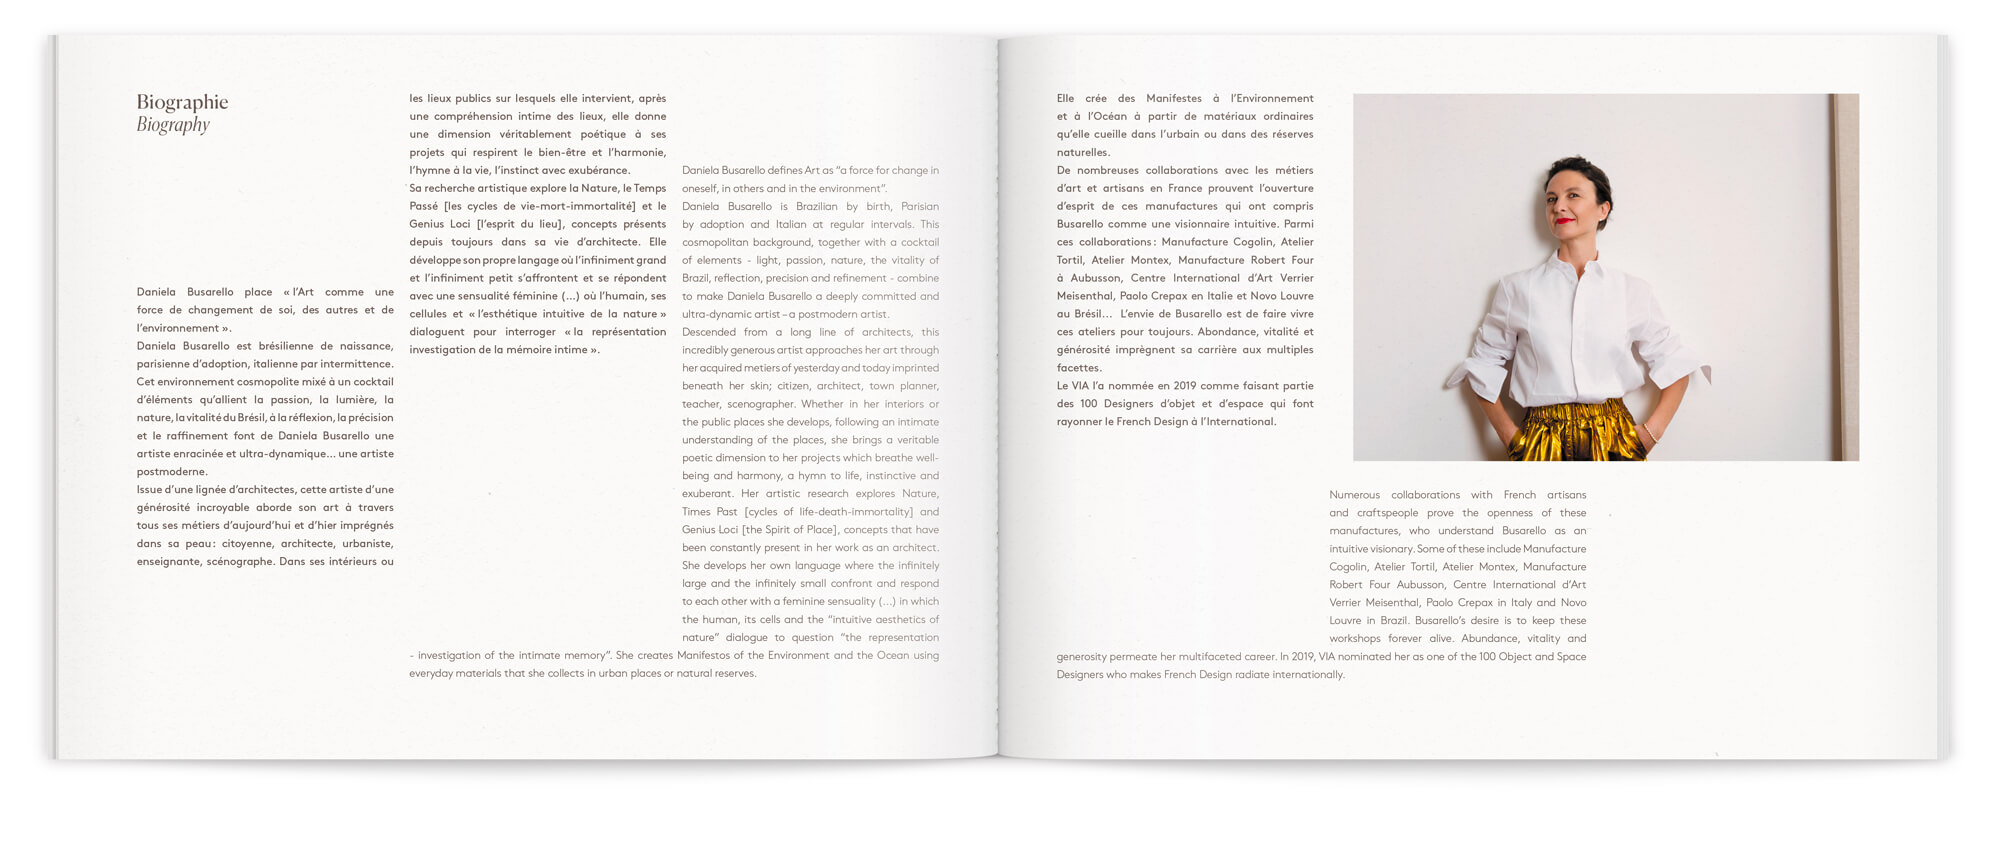 daniela-busarello-vida-livret-biographie-ichetkar